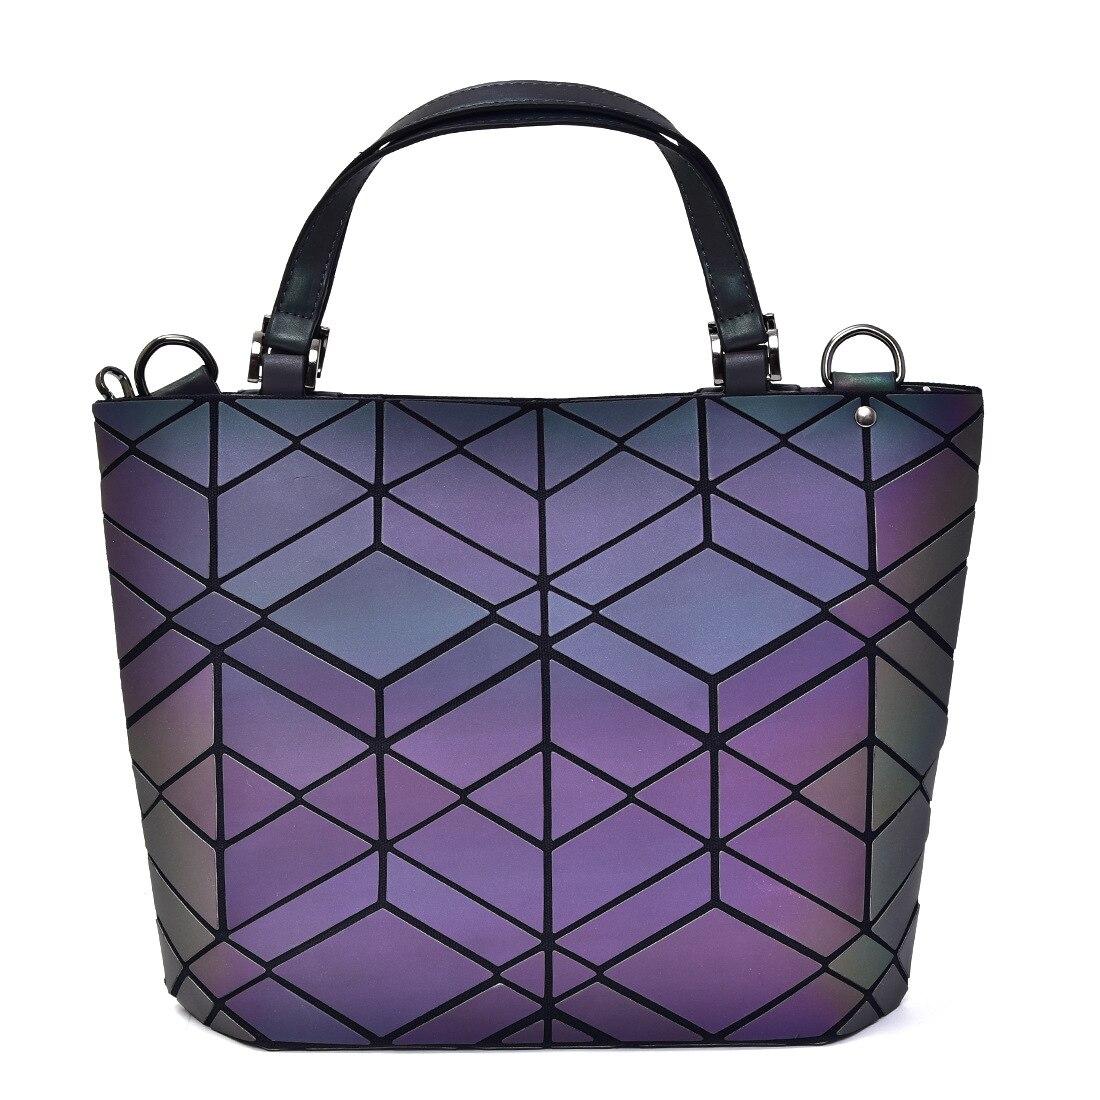 Luxury Handbags Women Bags Designer Geometric Luminous Color Change Tote Bags for Women 2019 Elegant Purses and Handbags